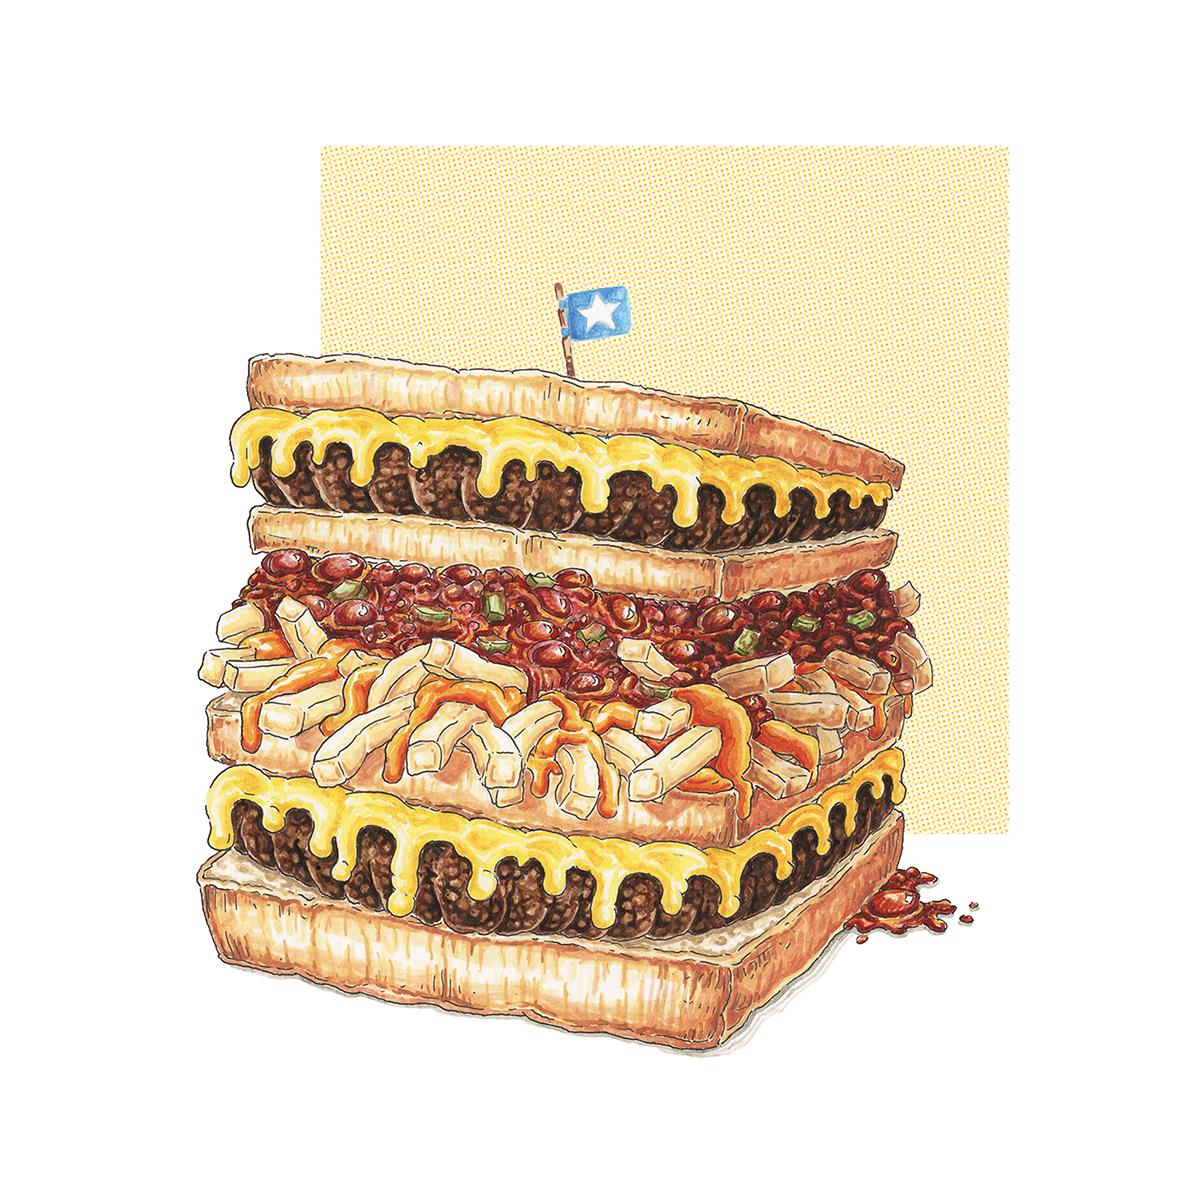 Food  america fast restaurant culture lunch grotesque delicious greasy fat hotdog Pizza burger sandwich color